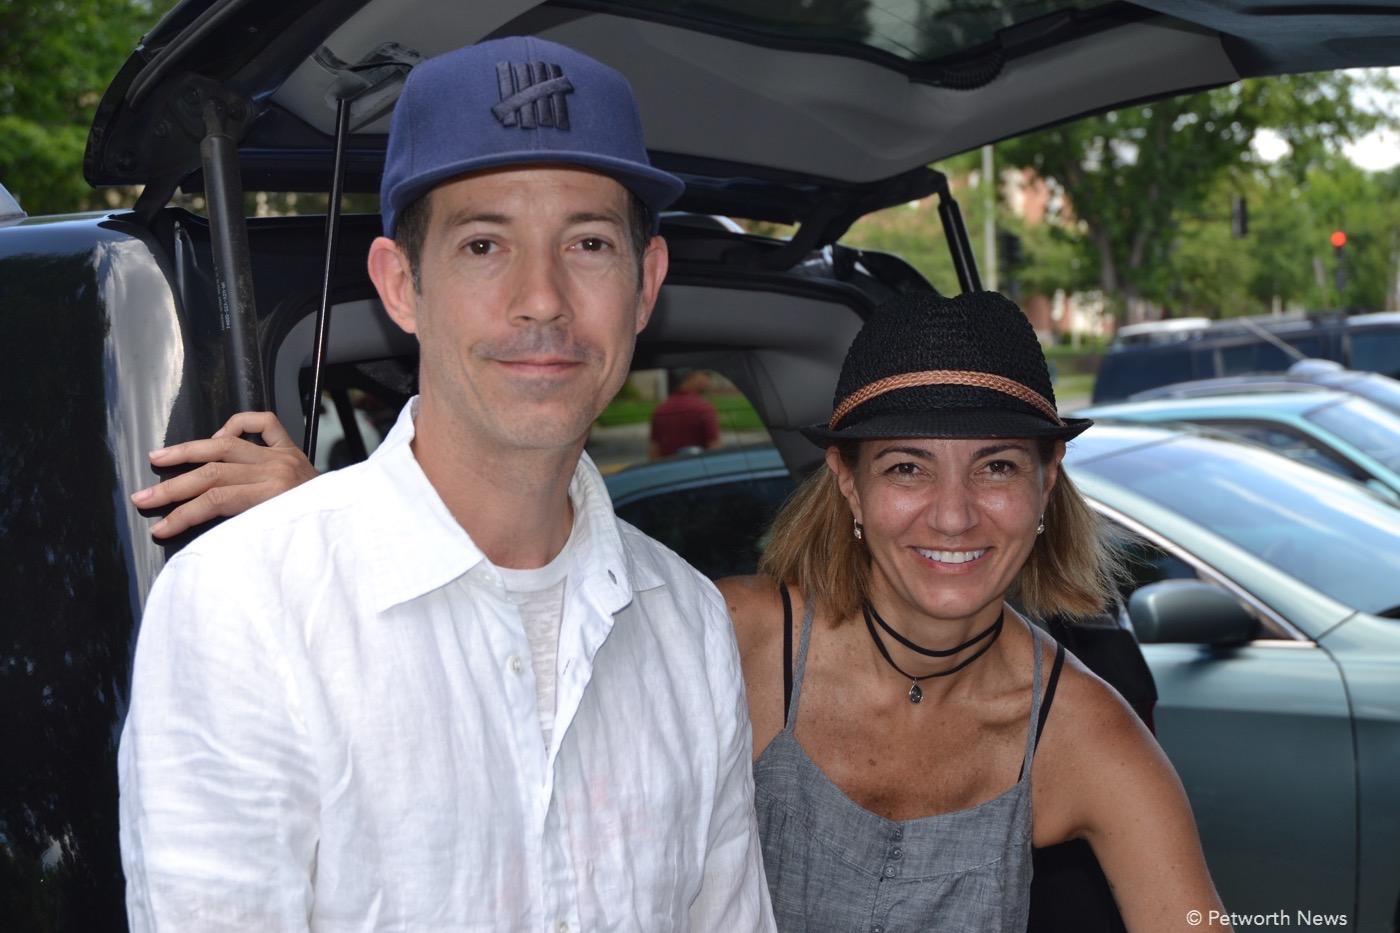 Tom Pipkin and Roberta Pardo